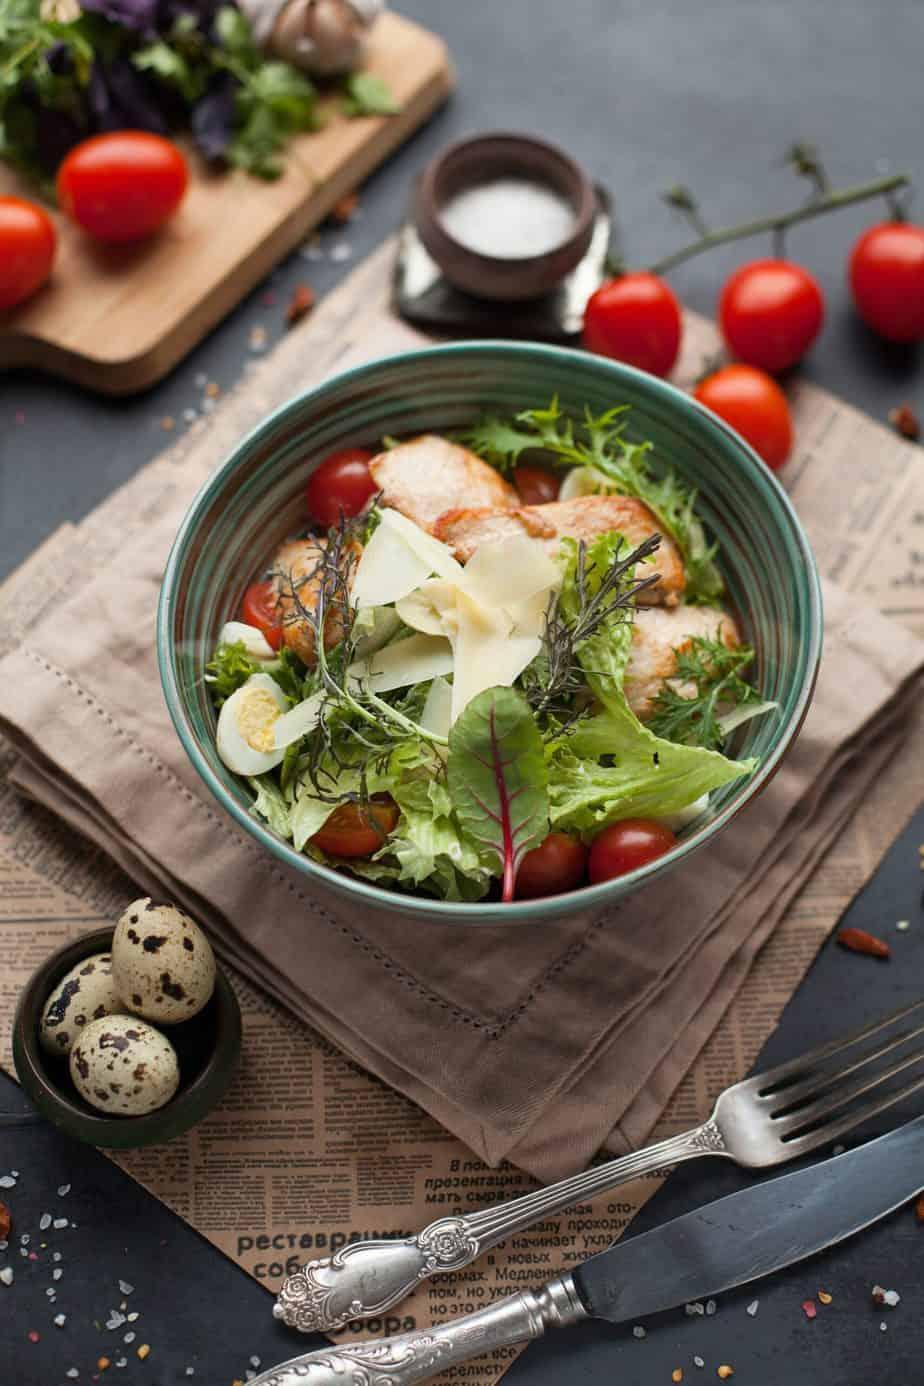 How long does Chicken Salad Last in Fridge